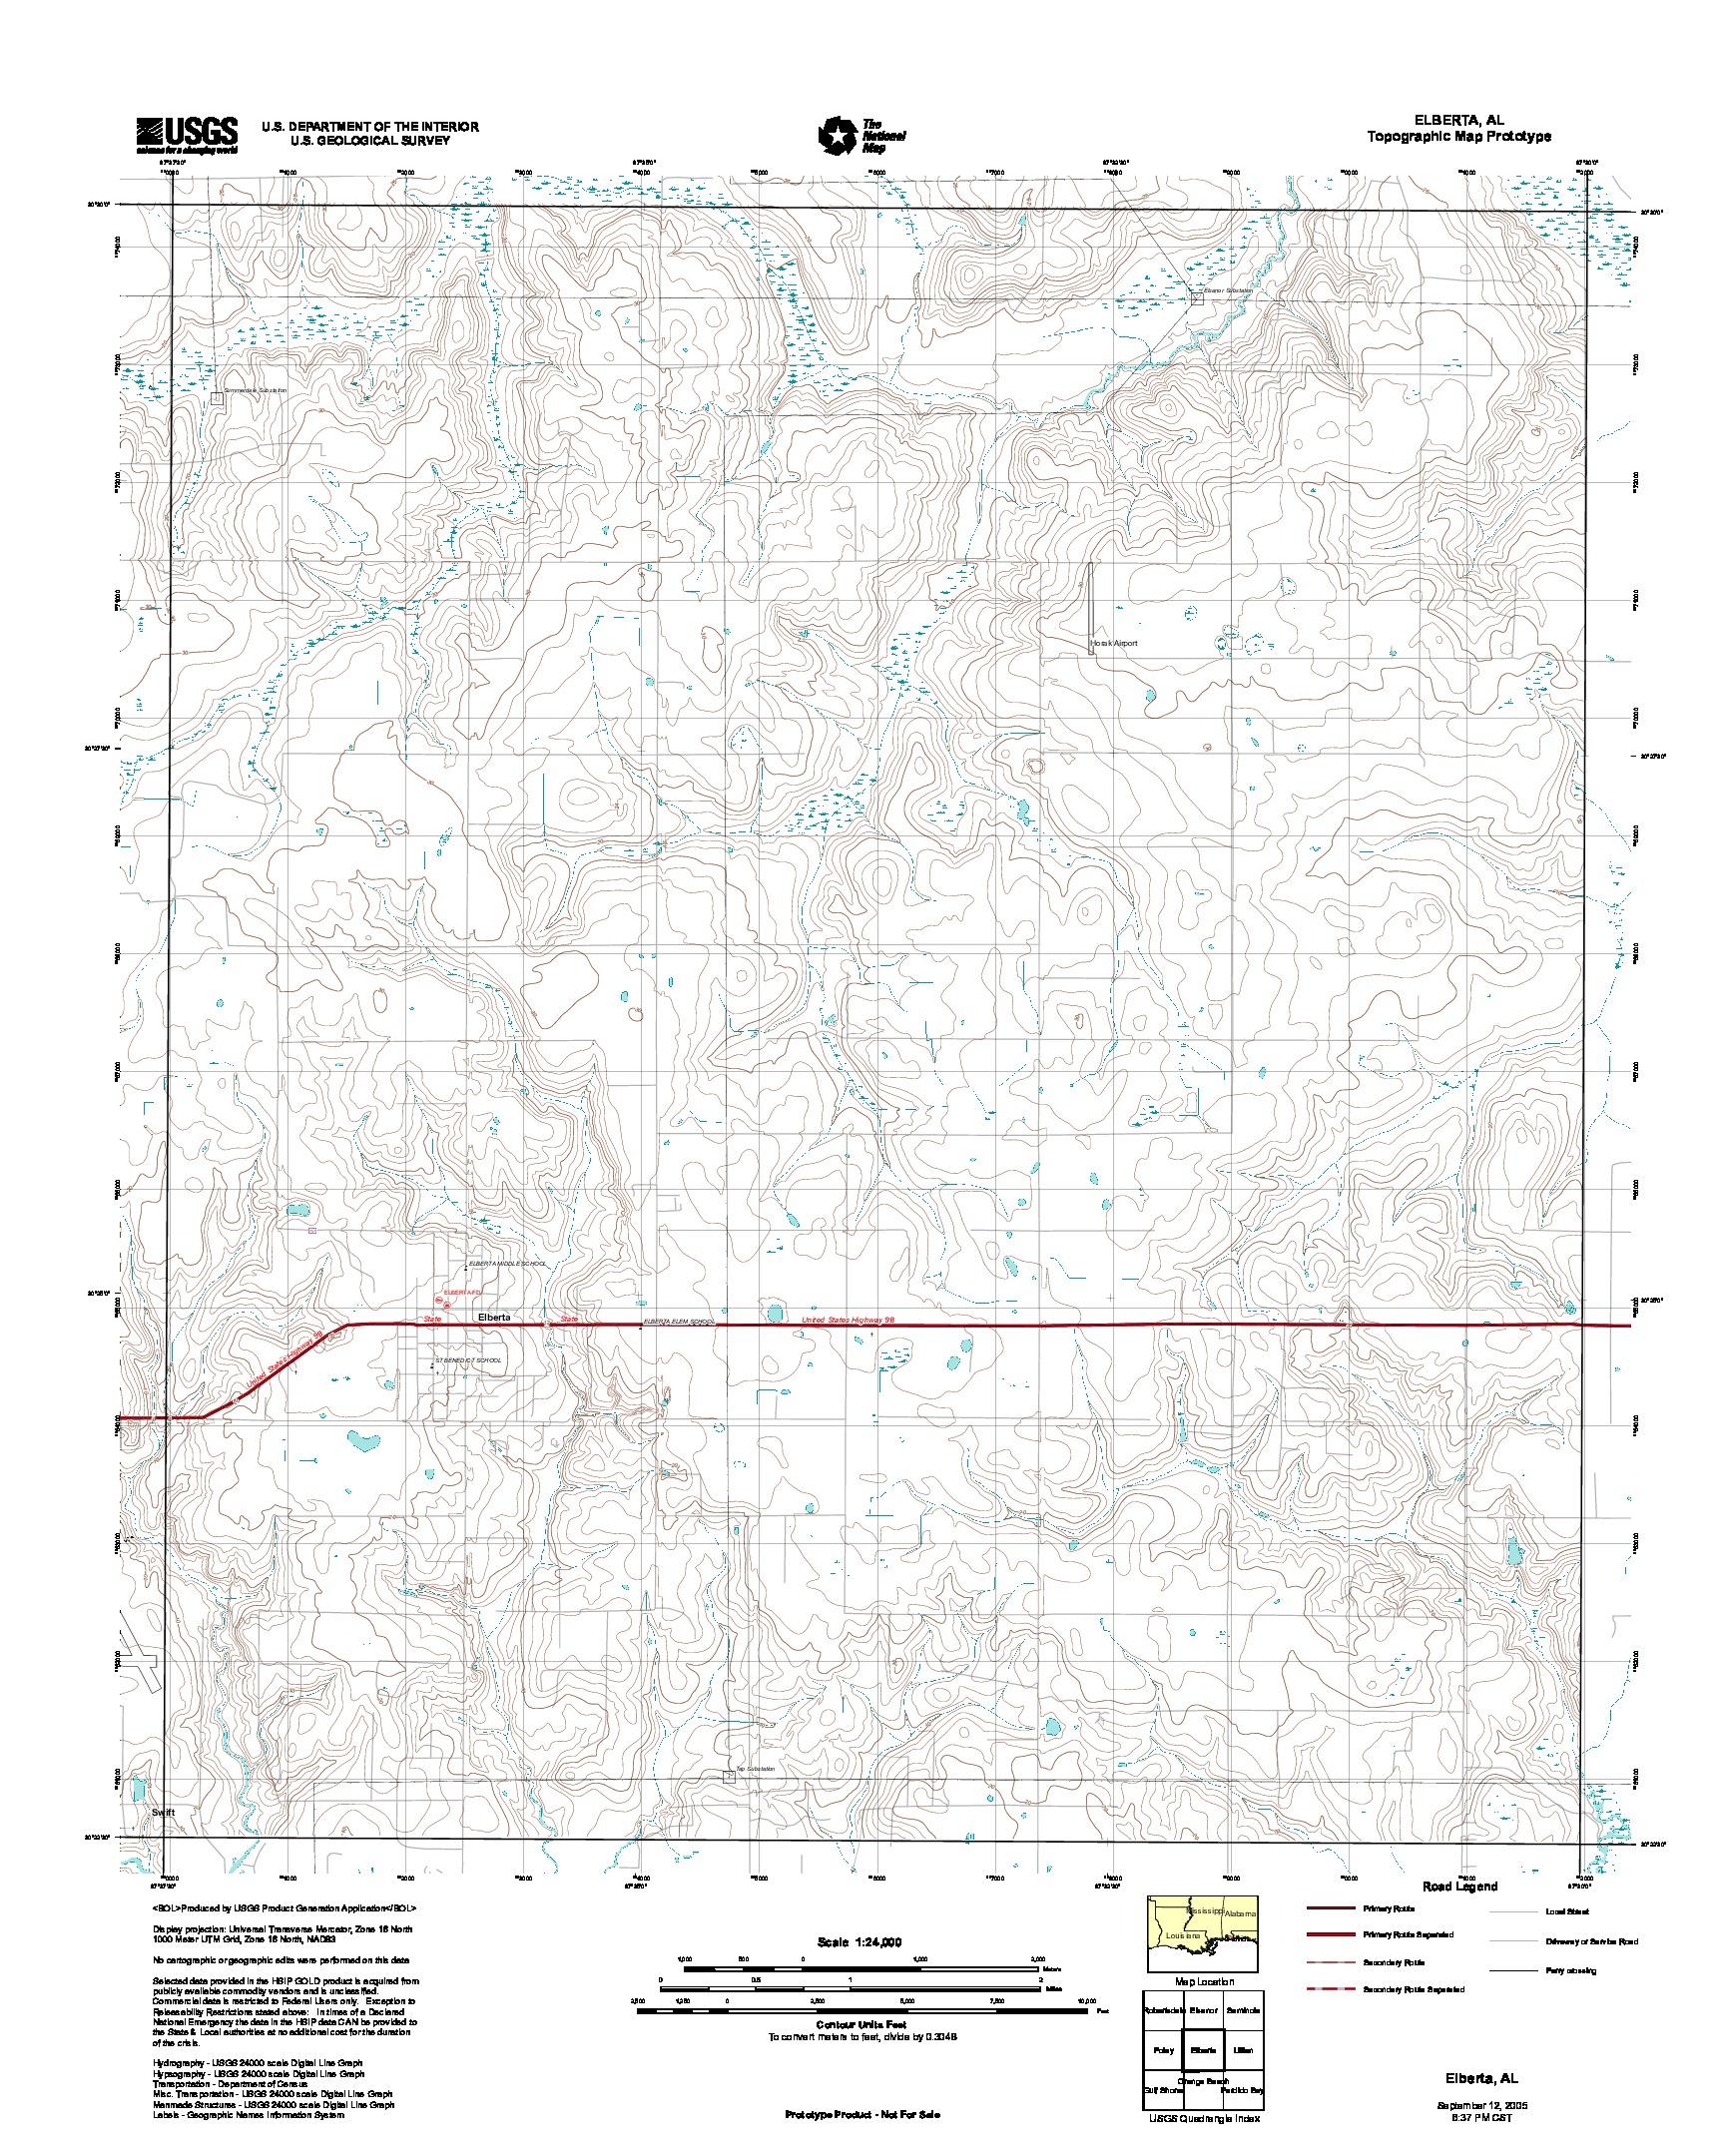 Elberta, Topographic Map Prototype, Alabama, United States, September 12, 2005